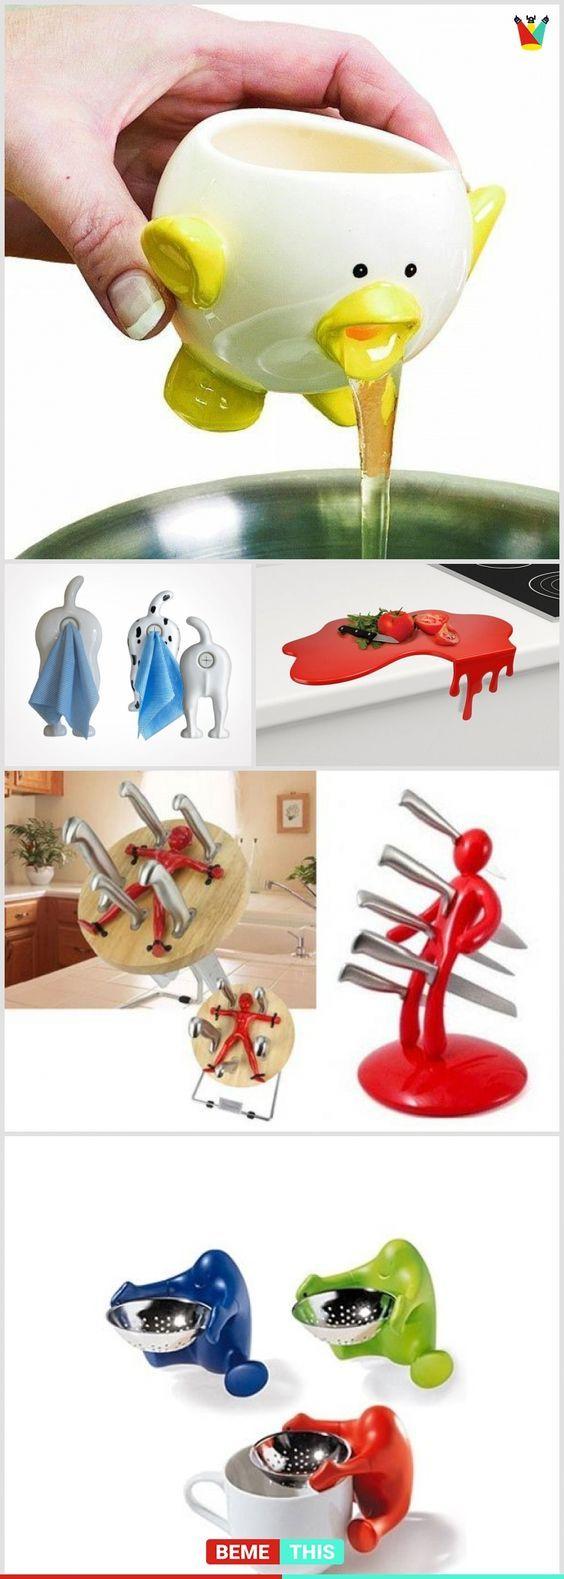 23 of The Funniest Yet Creative Kitchen Gadgets You Will EnjoyIsdiana Santi